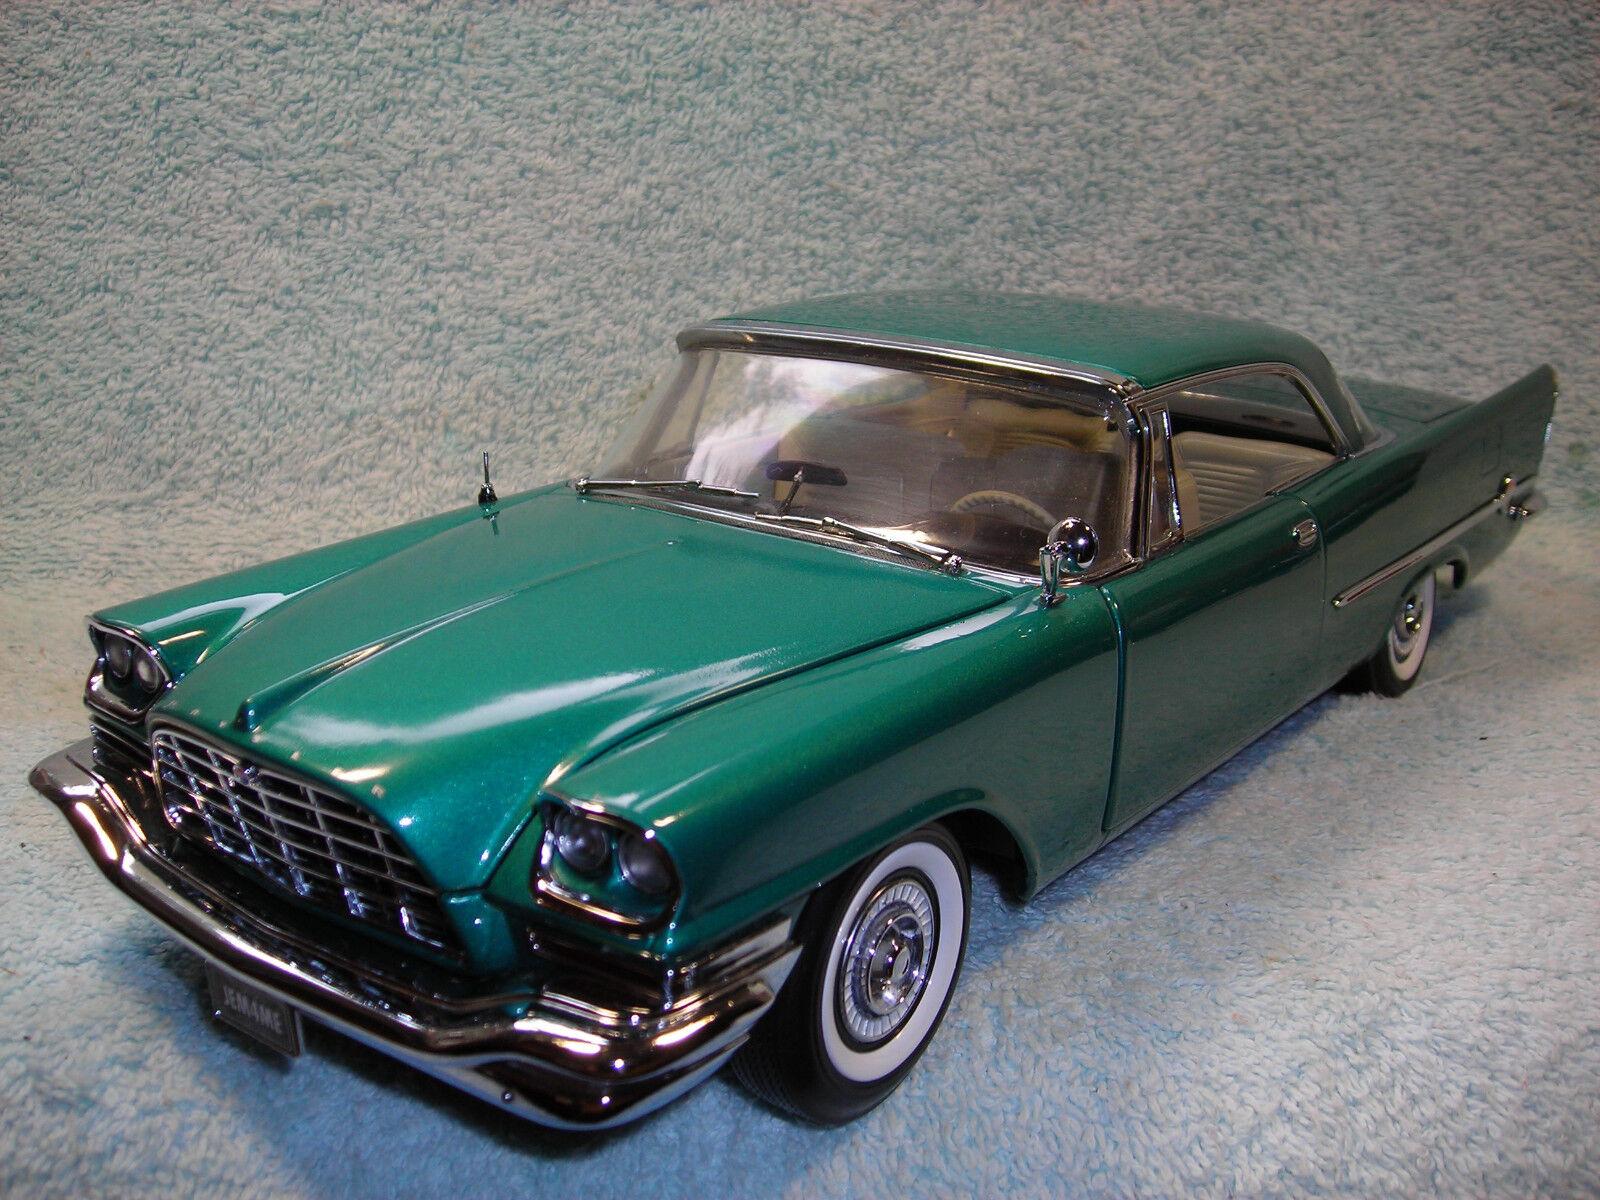 1/18 1957 CHRYSLER 300C HEMI IN METALLIC verde BY ERTL COLLECTIBLE MINT.